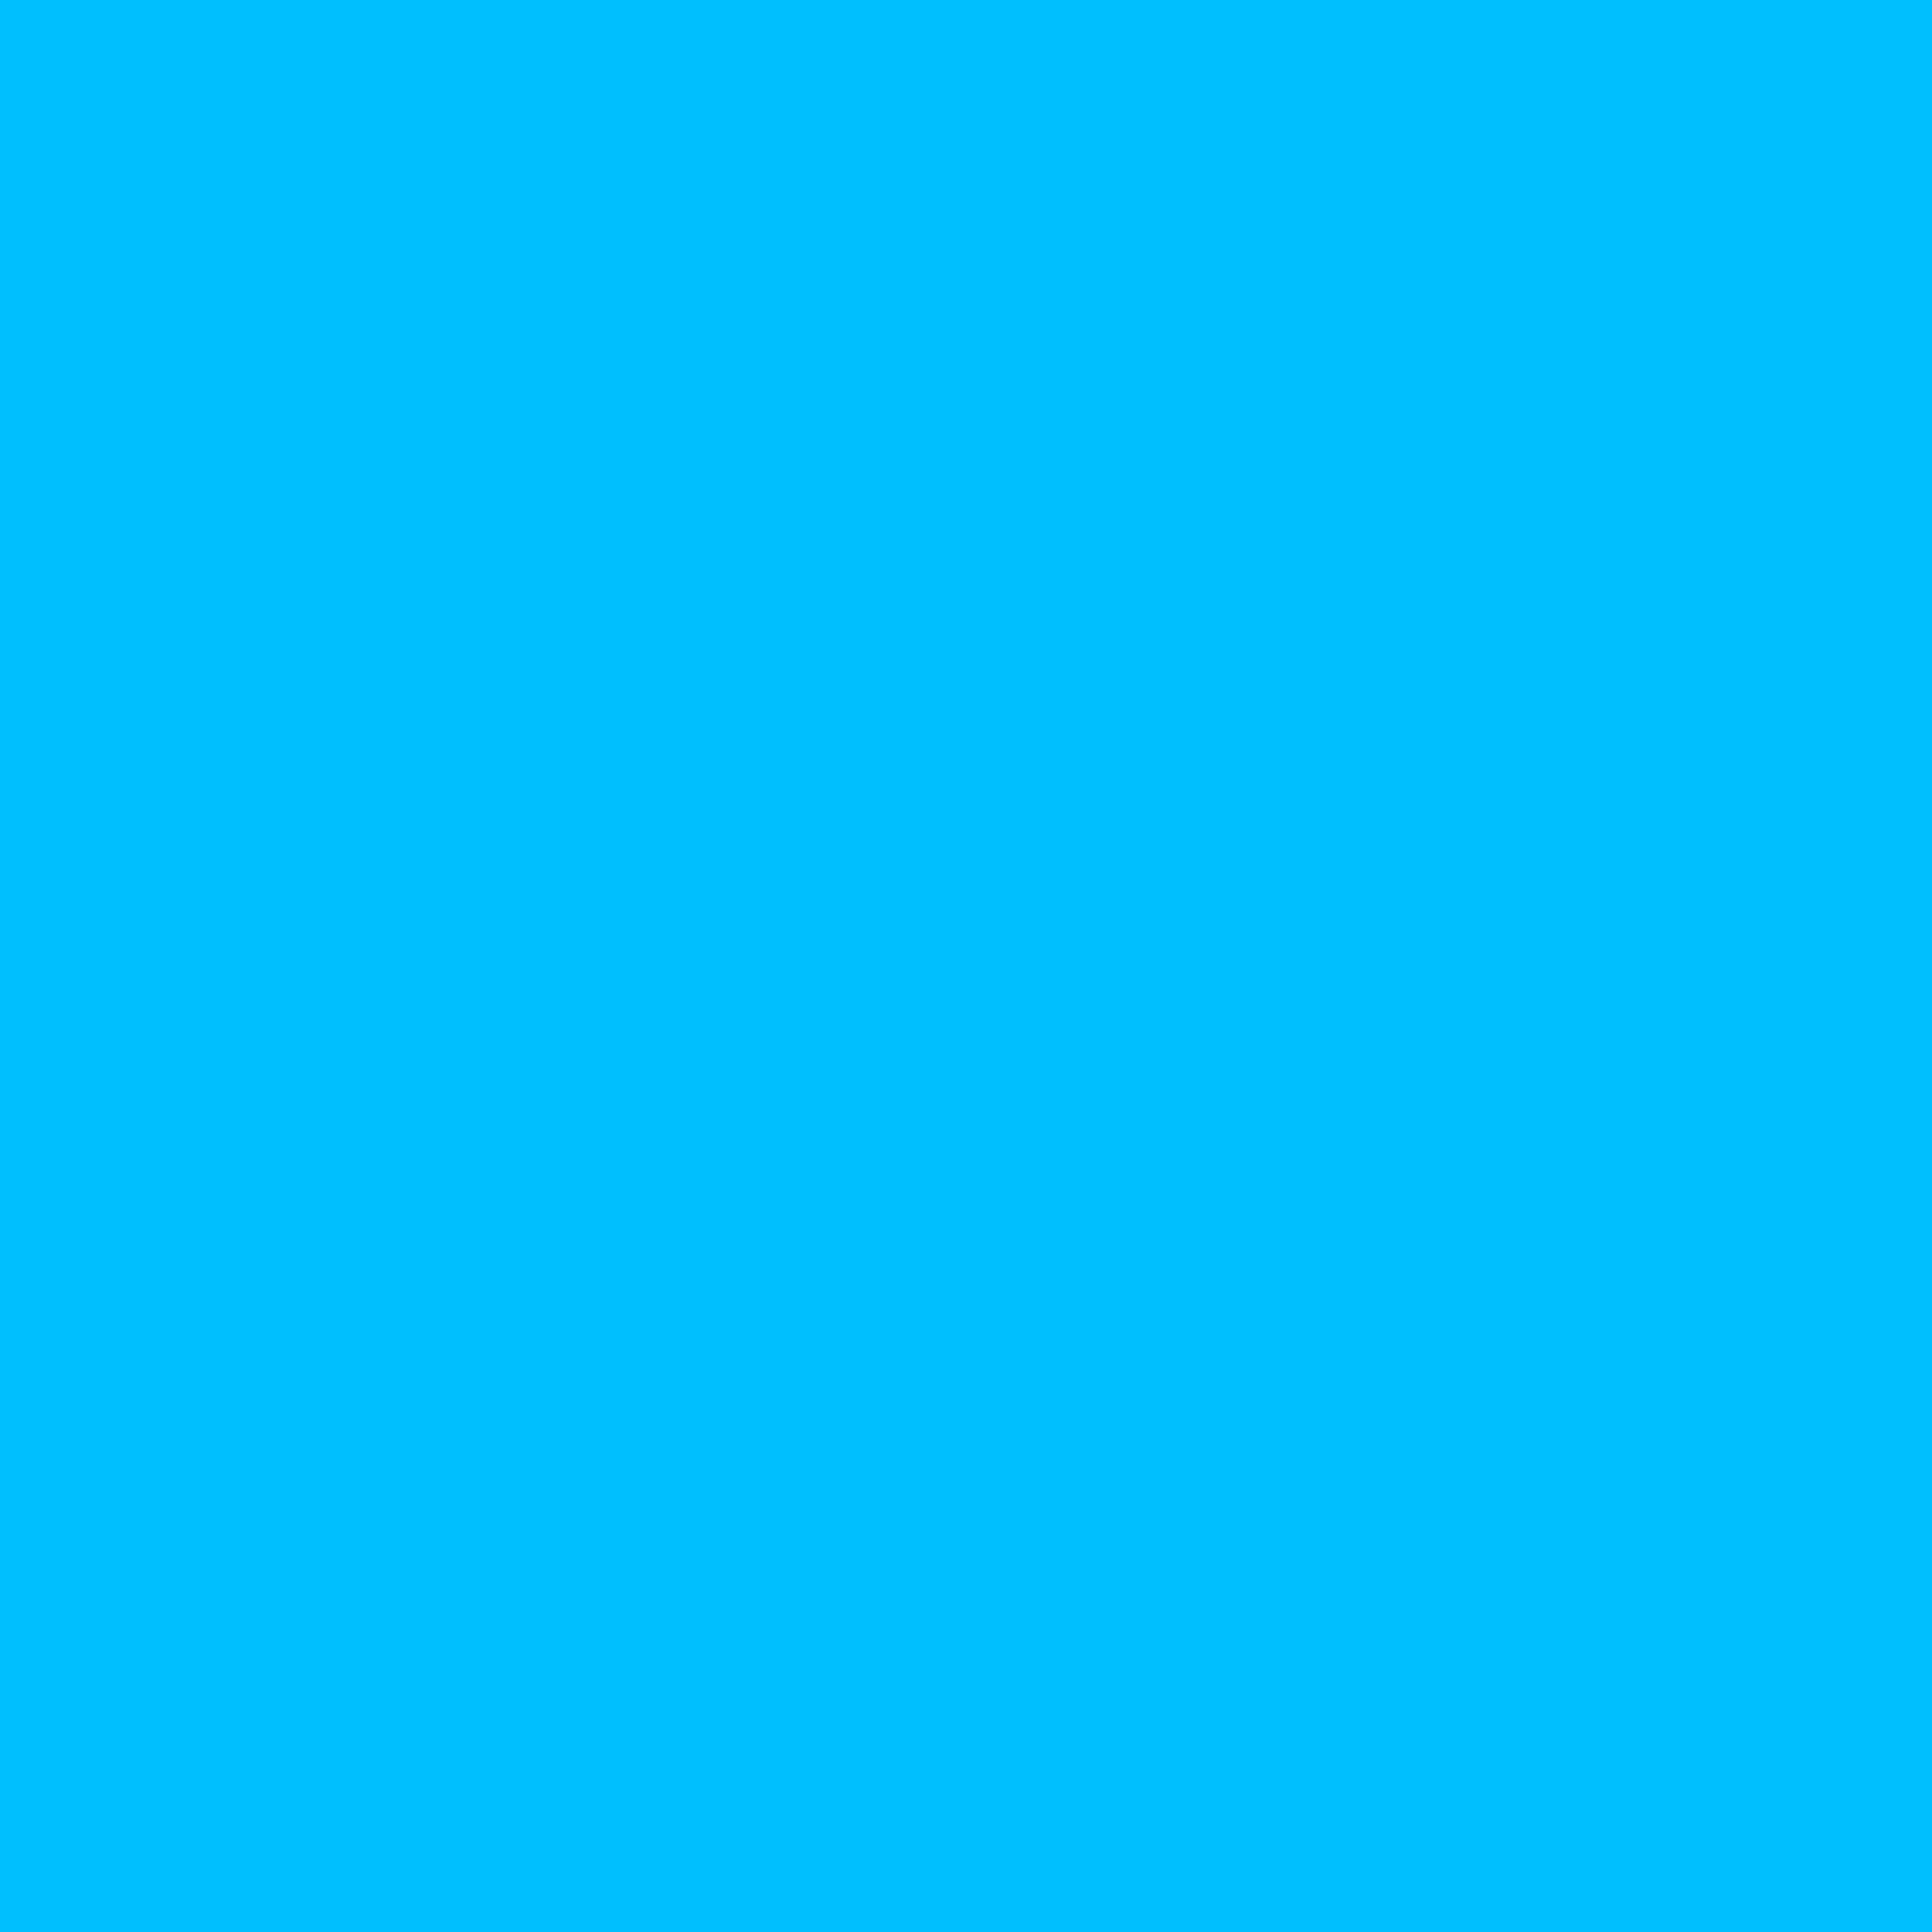 3600x3600 Deep Sky Blue Solid Color Background